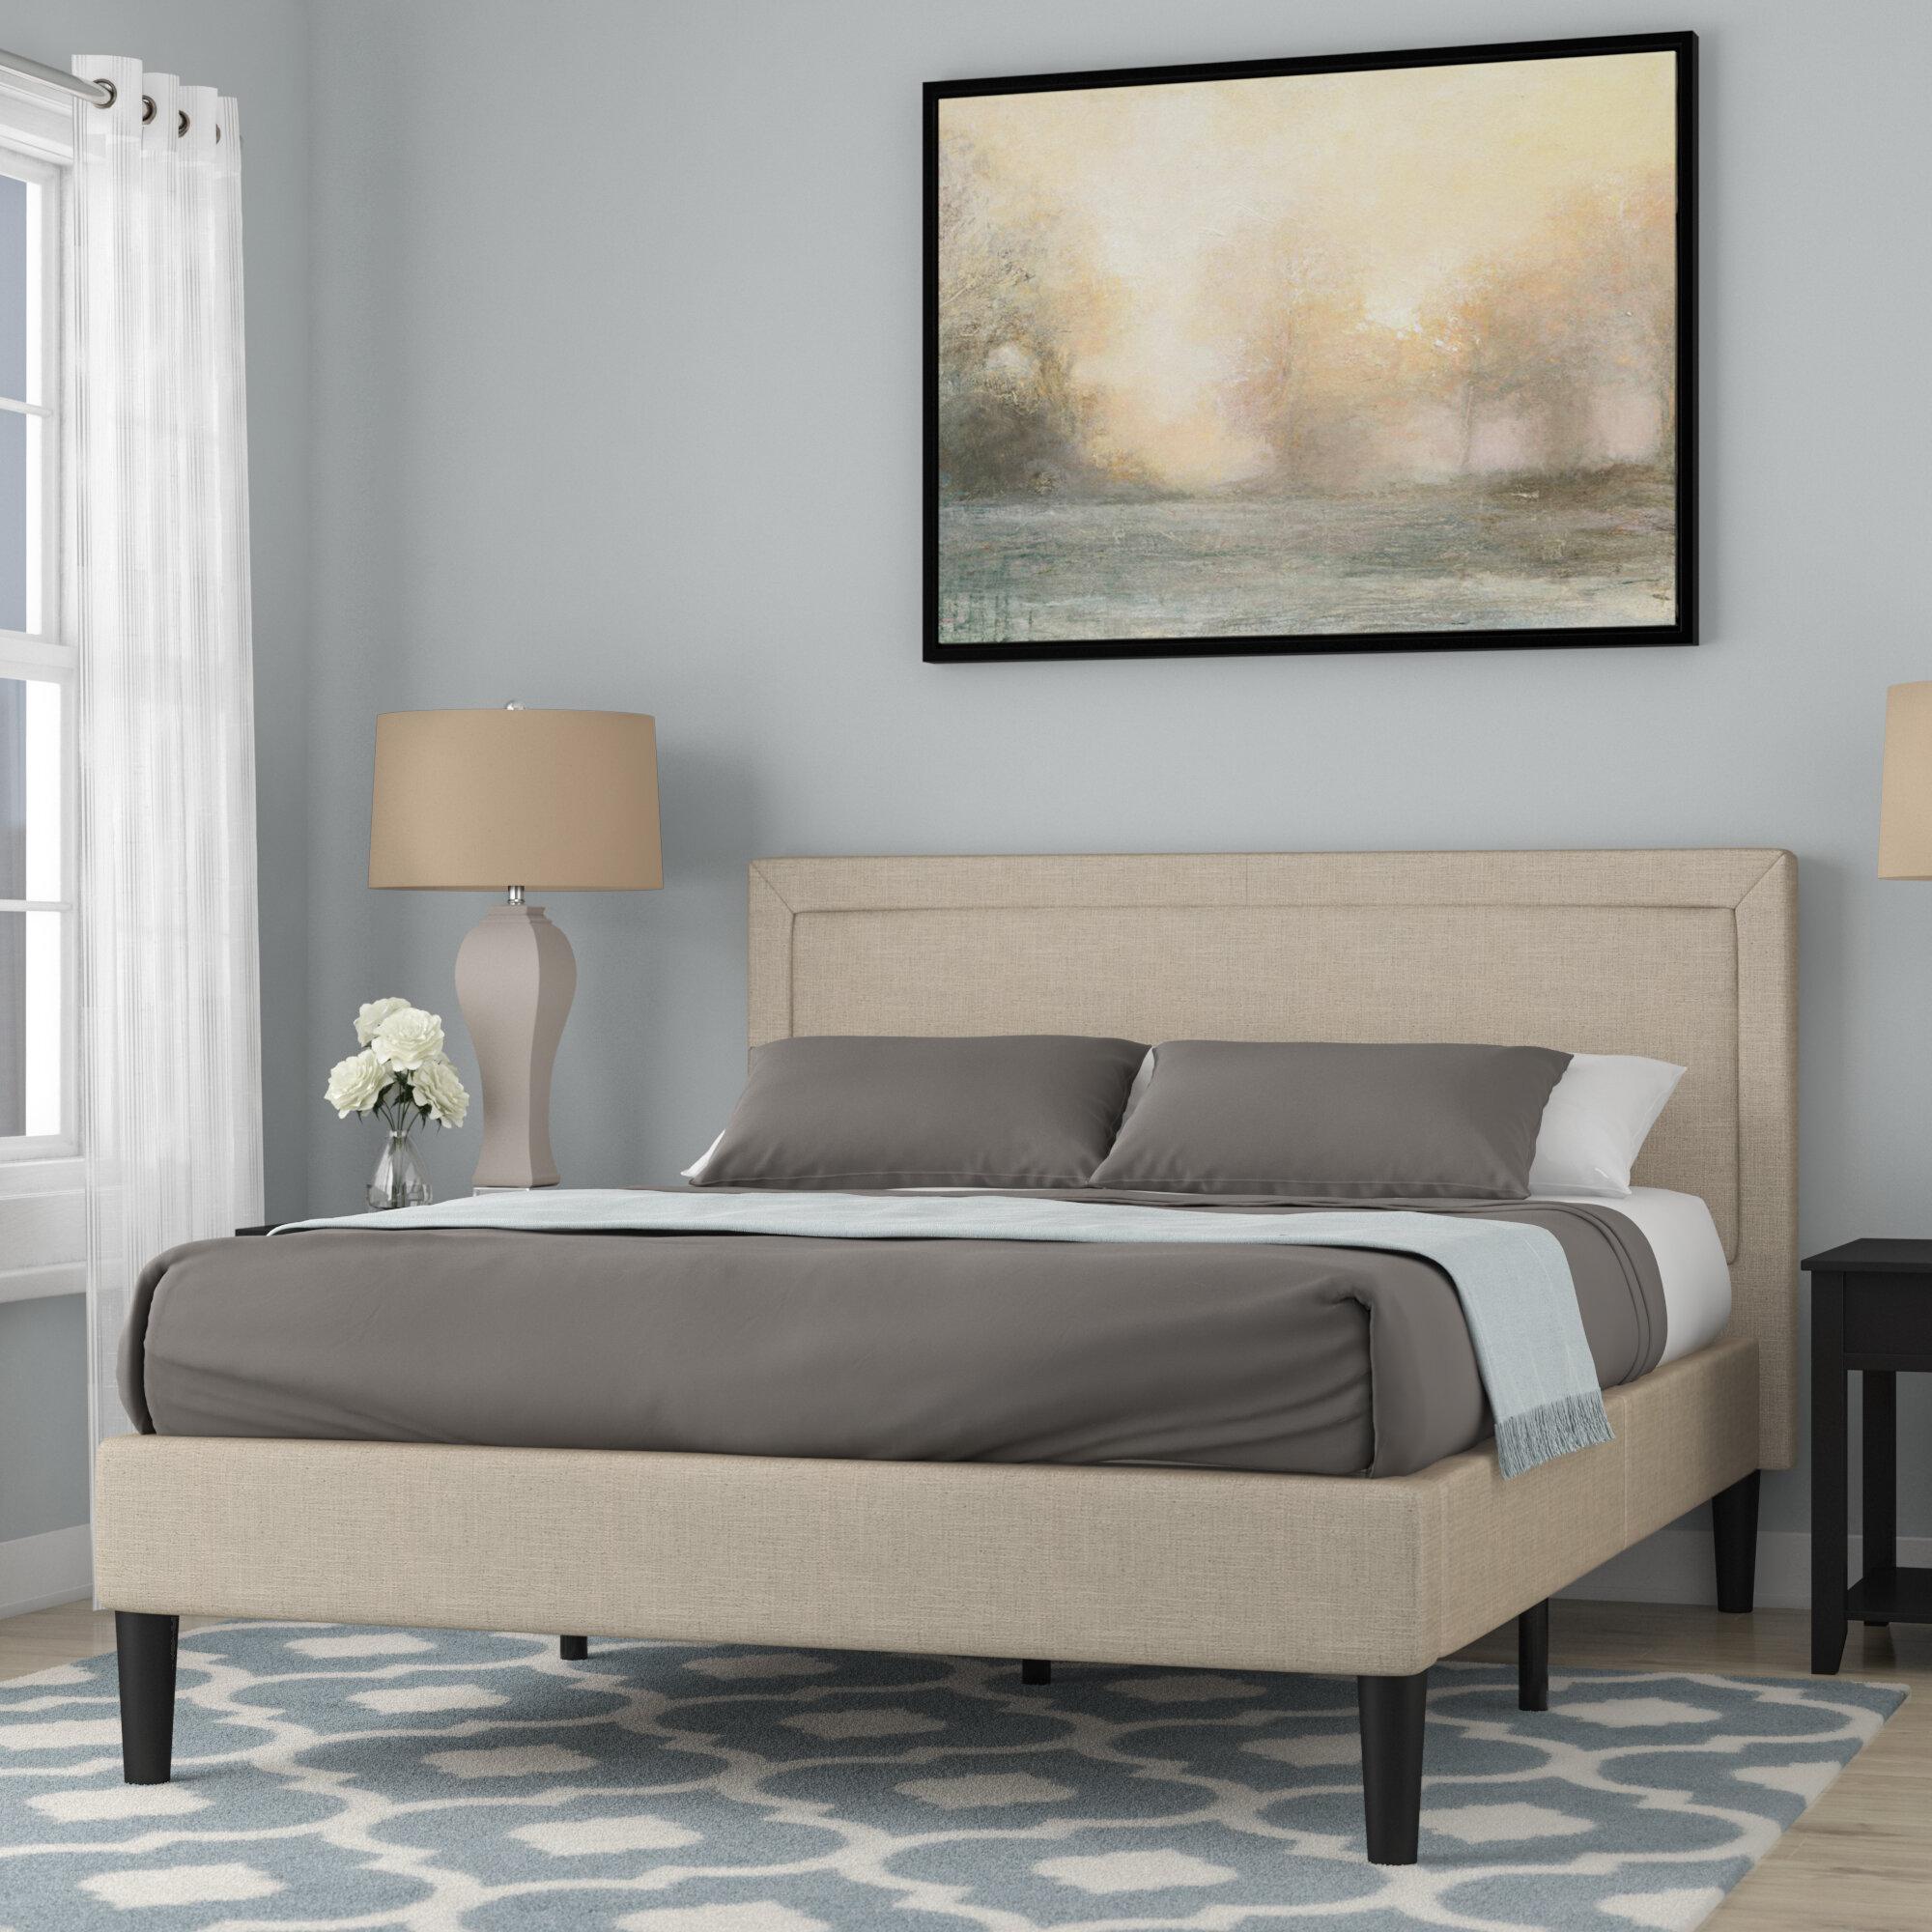 headboard with metal platform king modern beds floating pedestal bed low nightstands style japanese